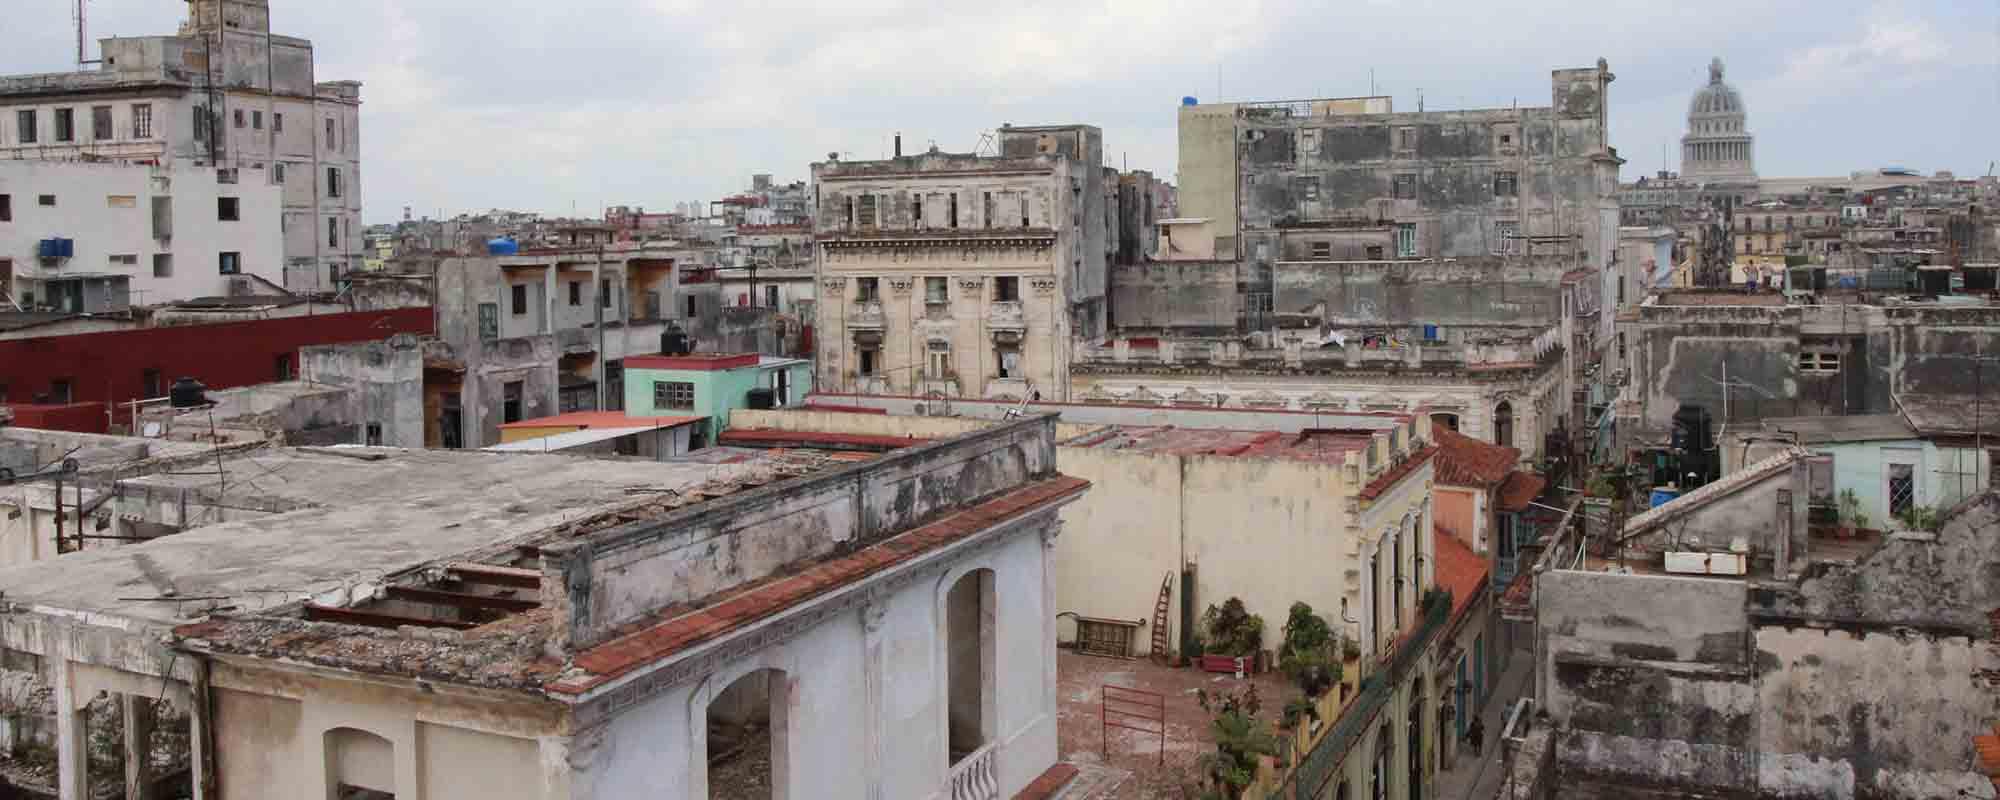 Chez Nous Art Deco, Havana